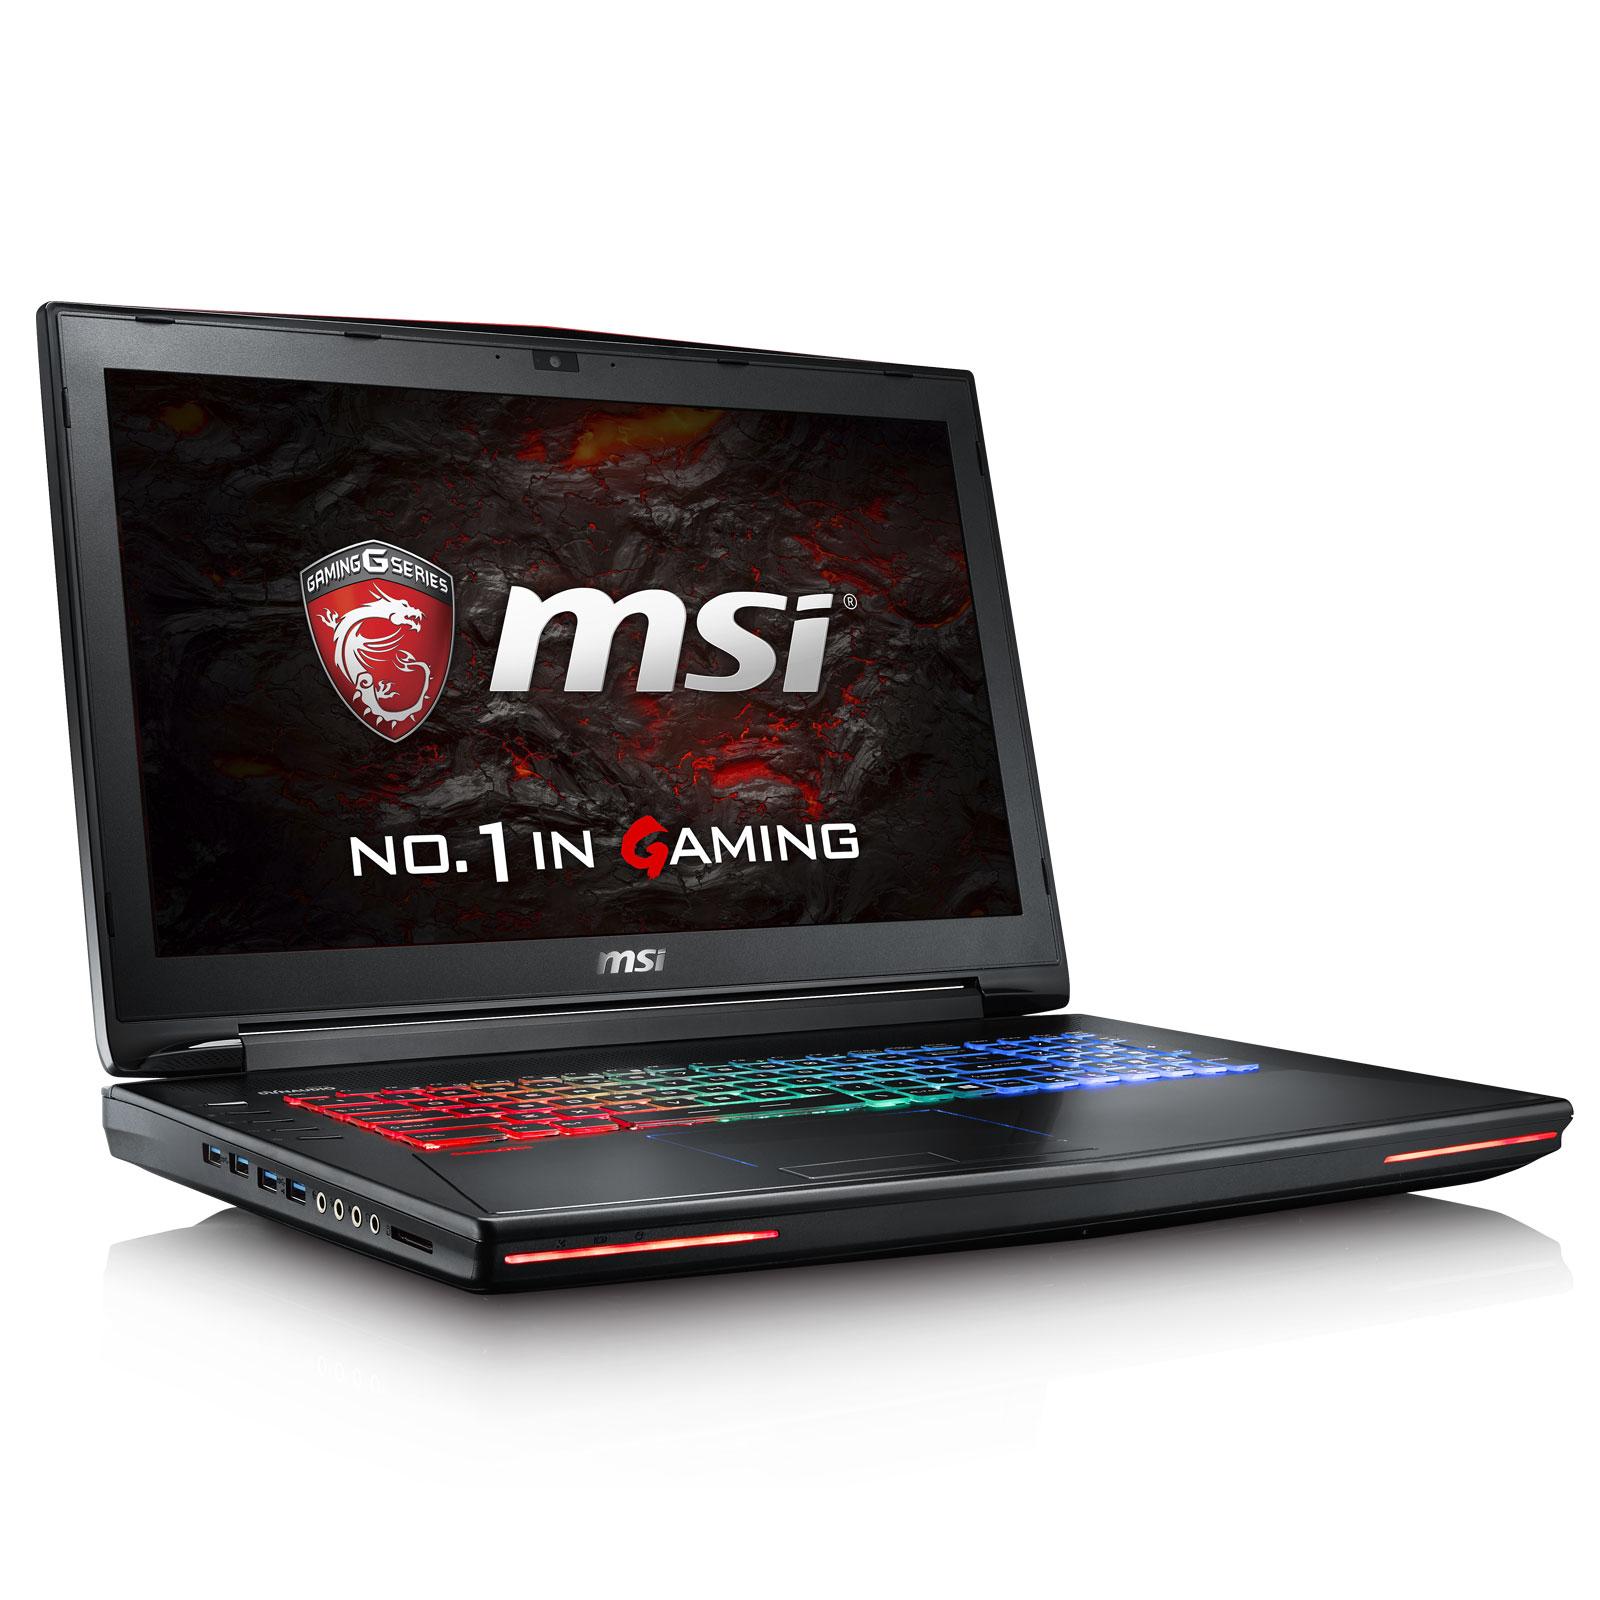 "PC portable MSI GT72VR 6RD-041FR Dominator Pro Intel Core i7-6700HQ 16 Go SSD 128 Go + HDD 1 To 17.3"" LED Full HD G-Sync NVIDIA GeForce GTX 1060 6 Go Graveur DVD Wi-Fi AC/Bluetooth Webcam Windows 10 Famille (garantie constructeur 2 ans)"